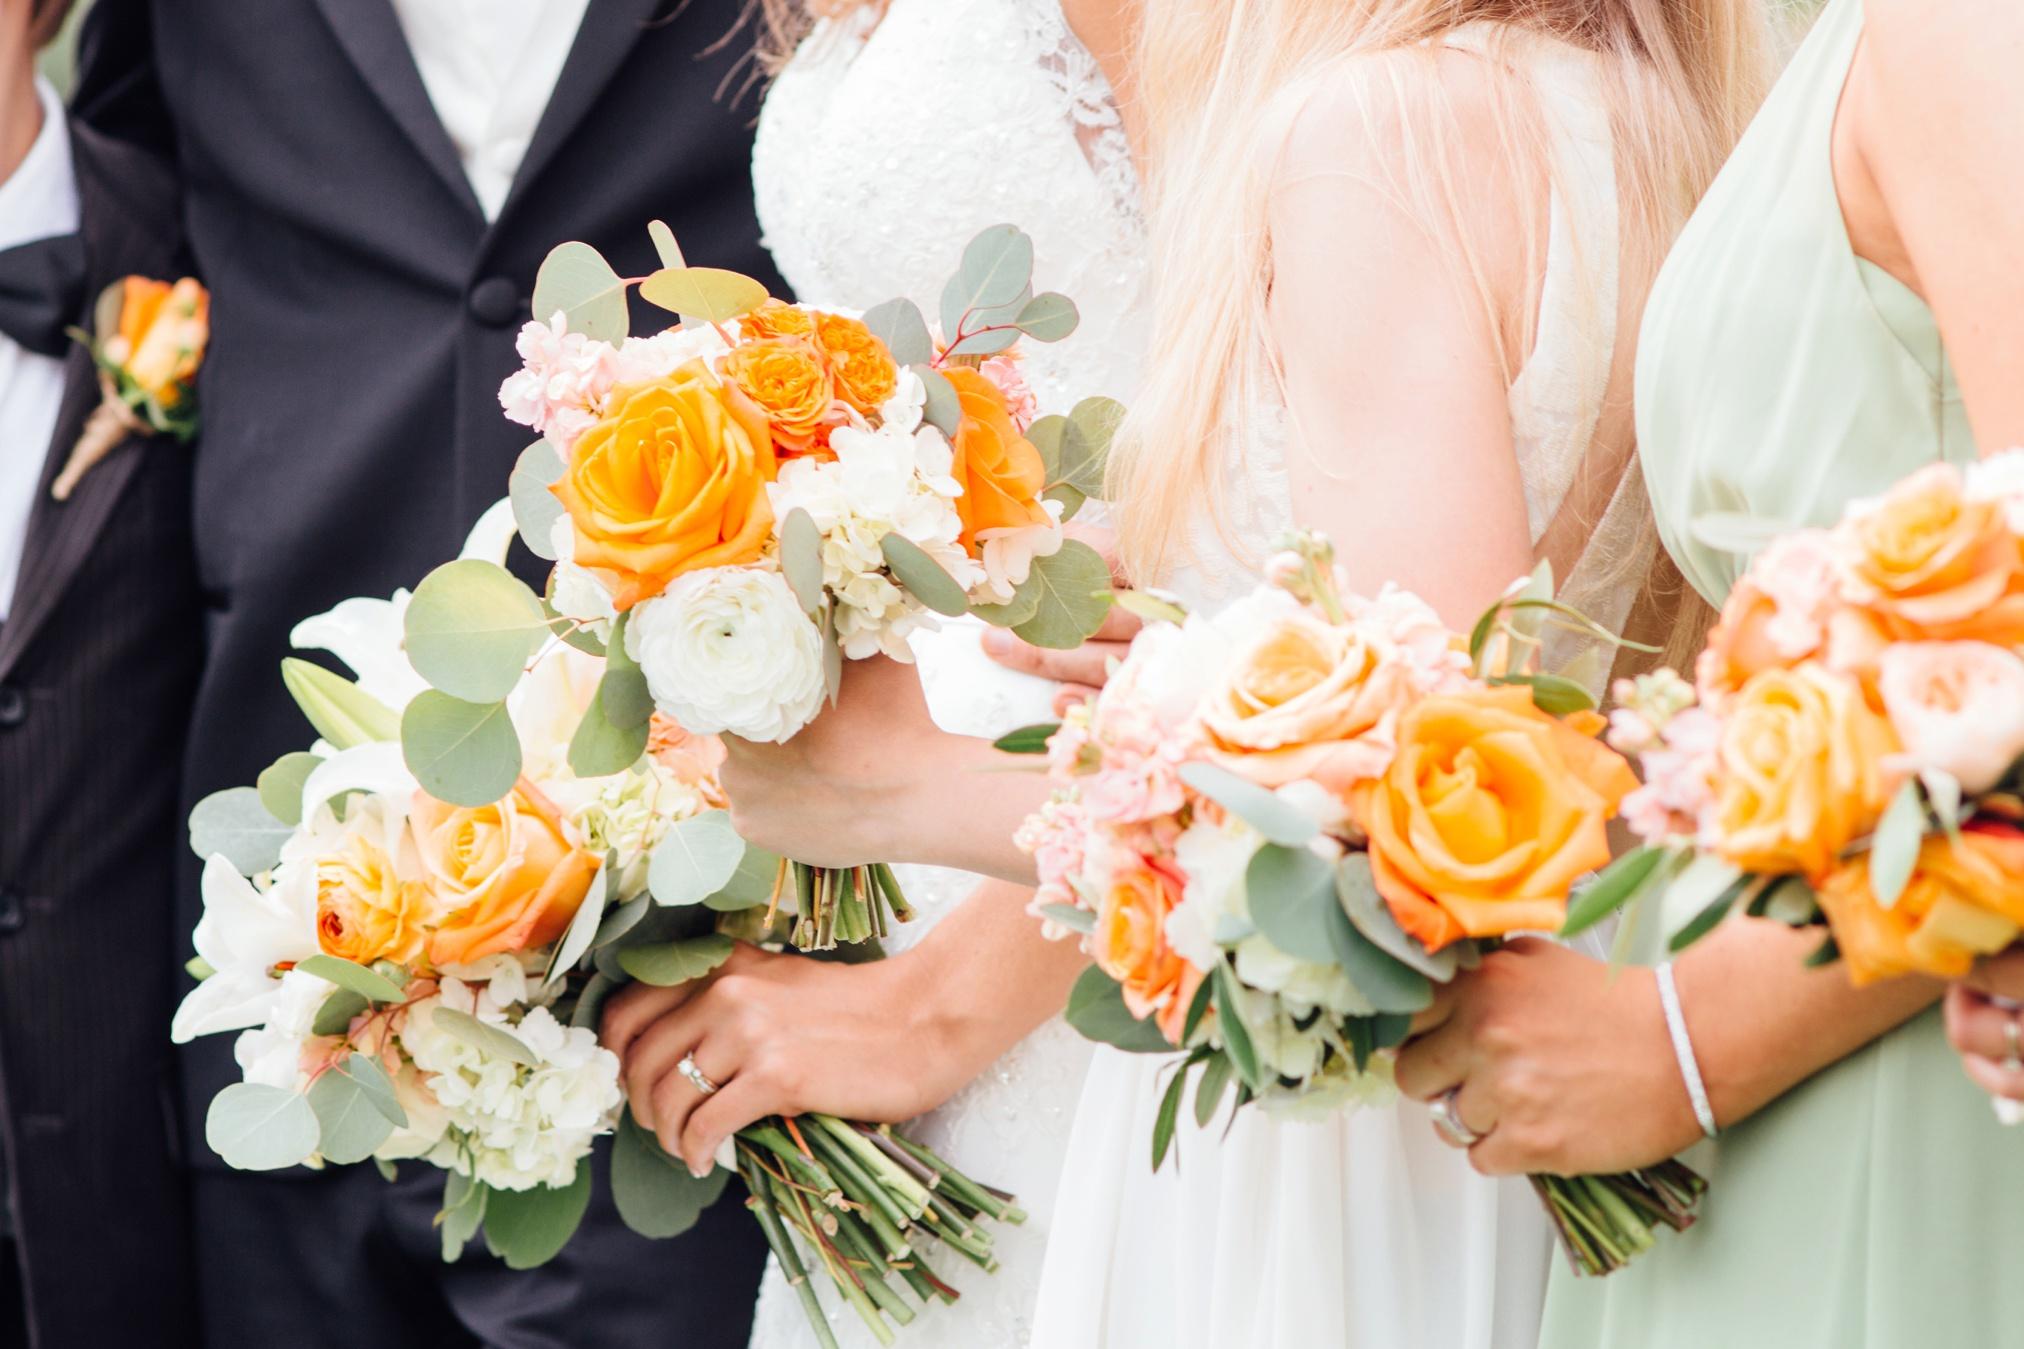 schmid_wedding-6152.jpg